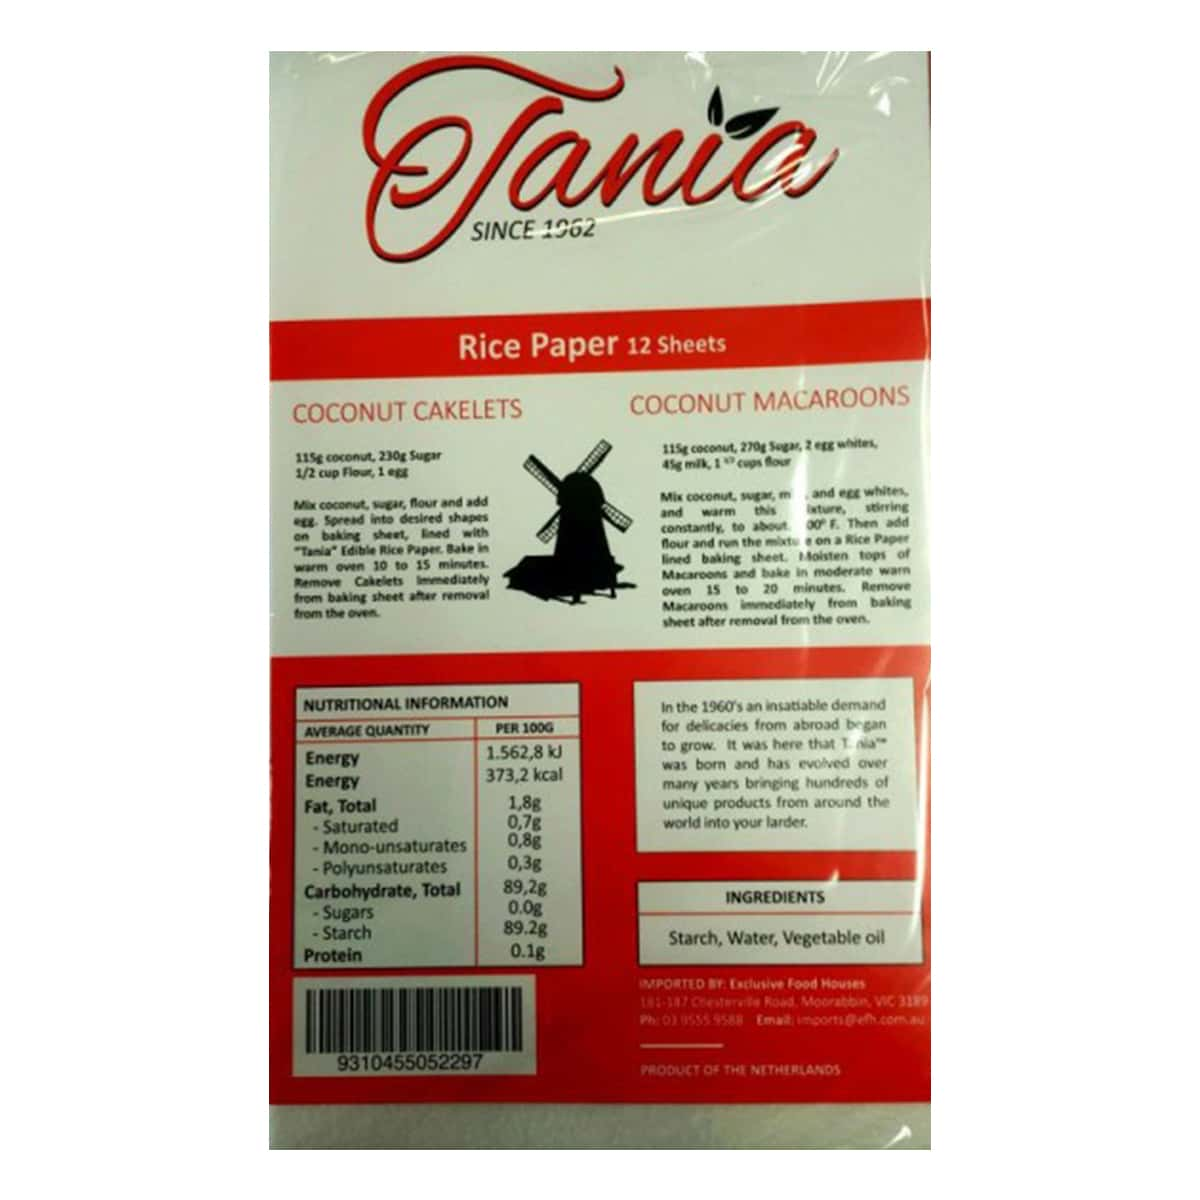 Buy Tania Rice Paper (12 Sheets) - 40 gm